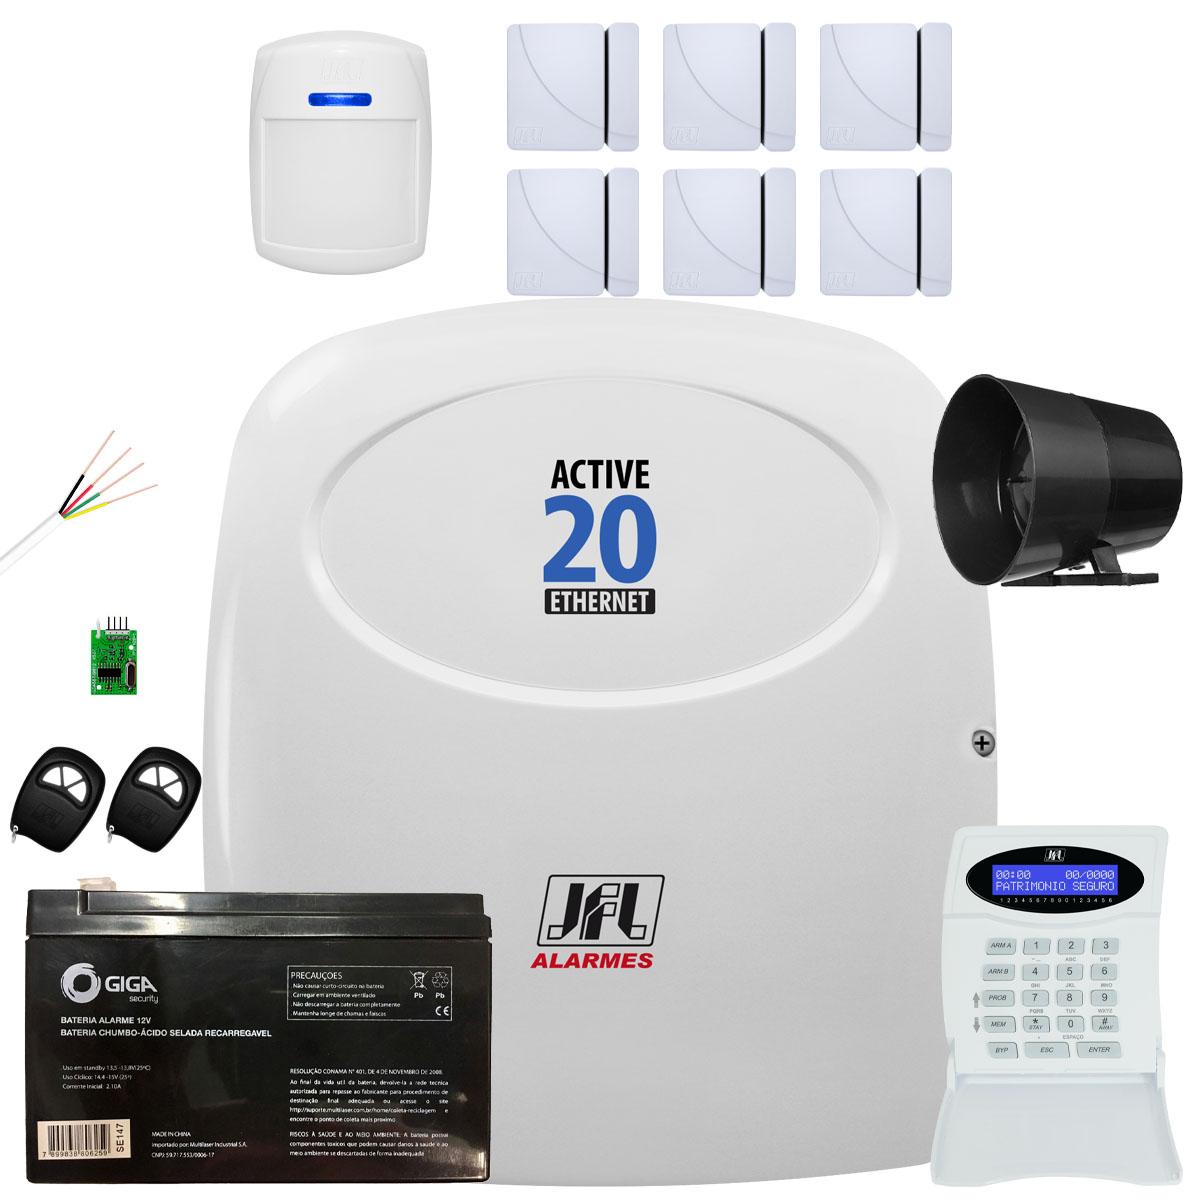 Kit Alarme Residencial Active 20 Ethernet Com Shc Fit E Ds 410 Jfl